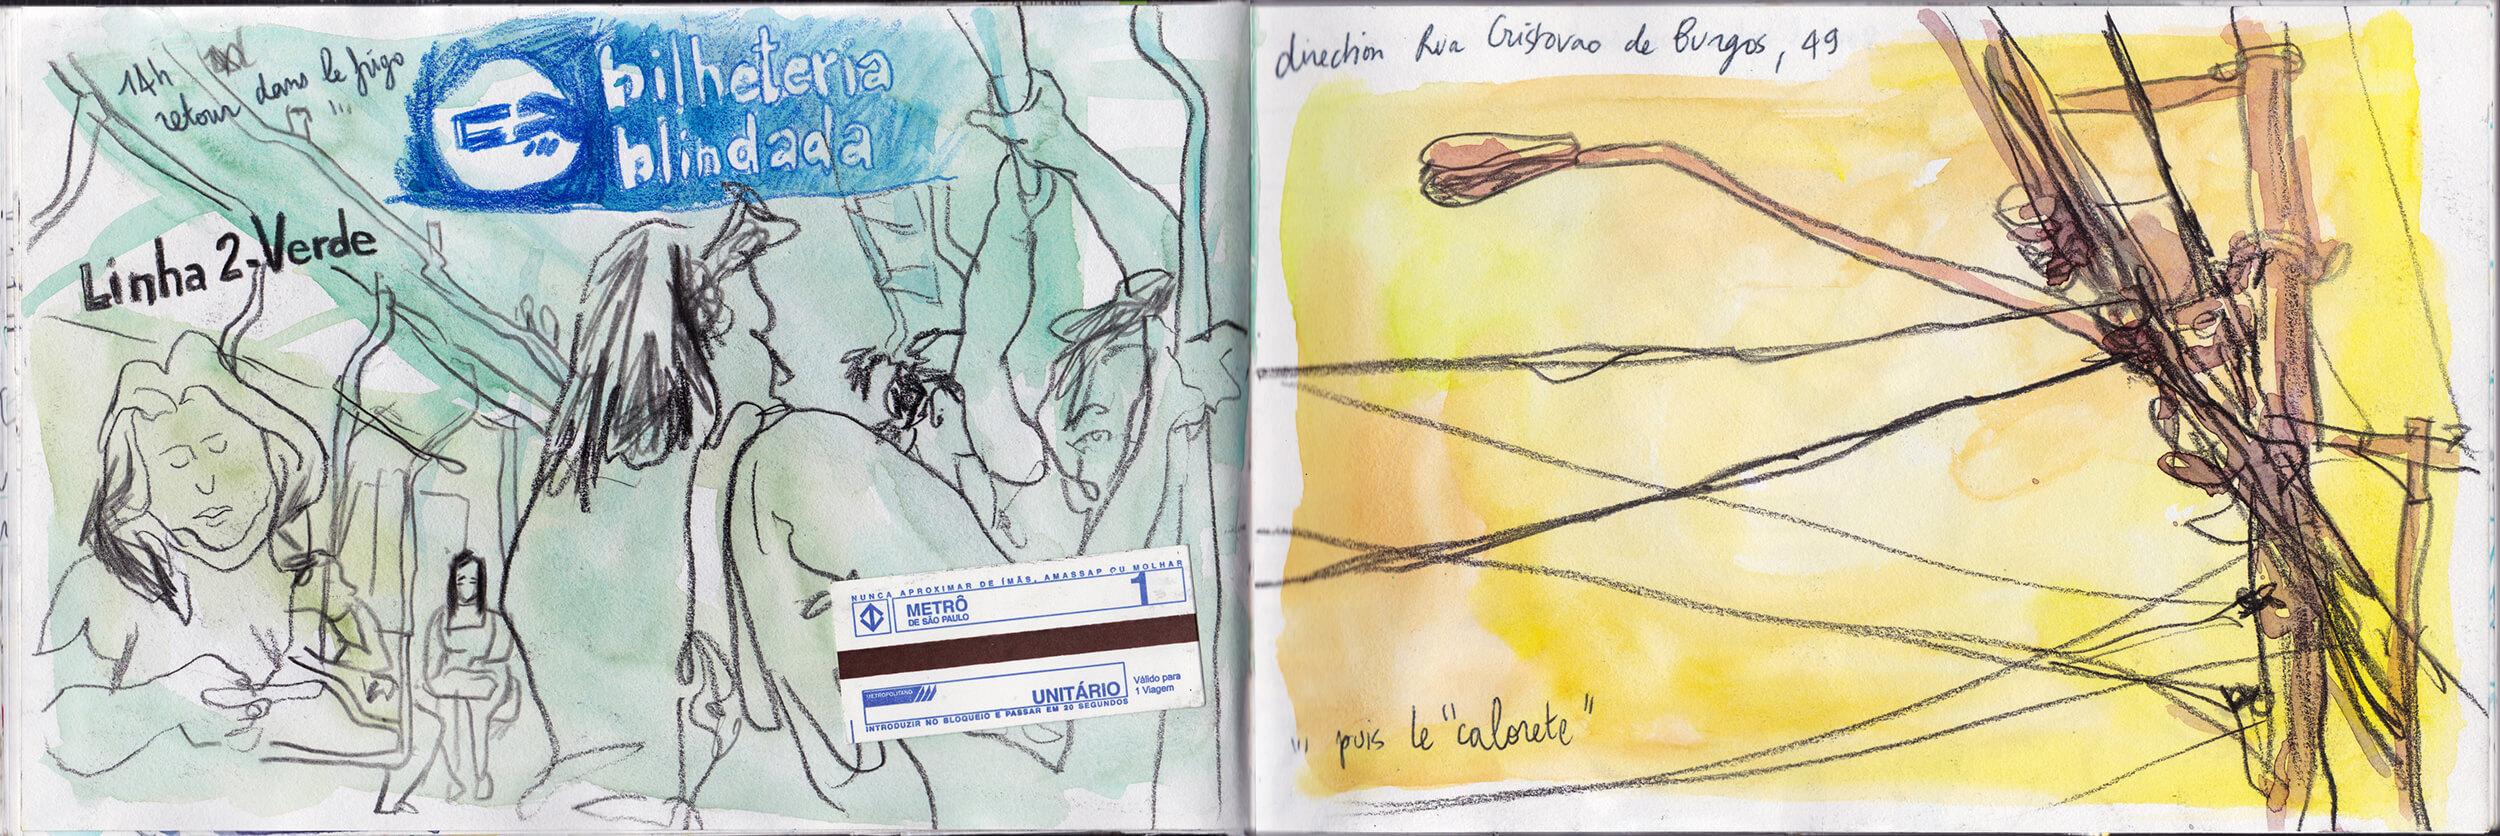 Carnet de voyage de Futura Brasil par Piero